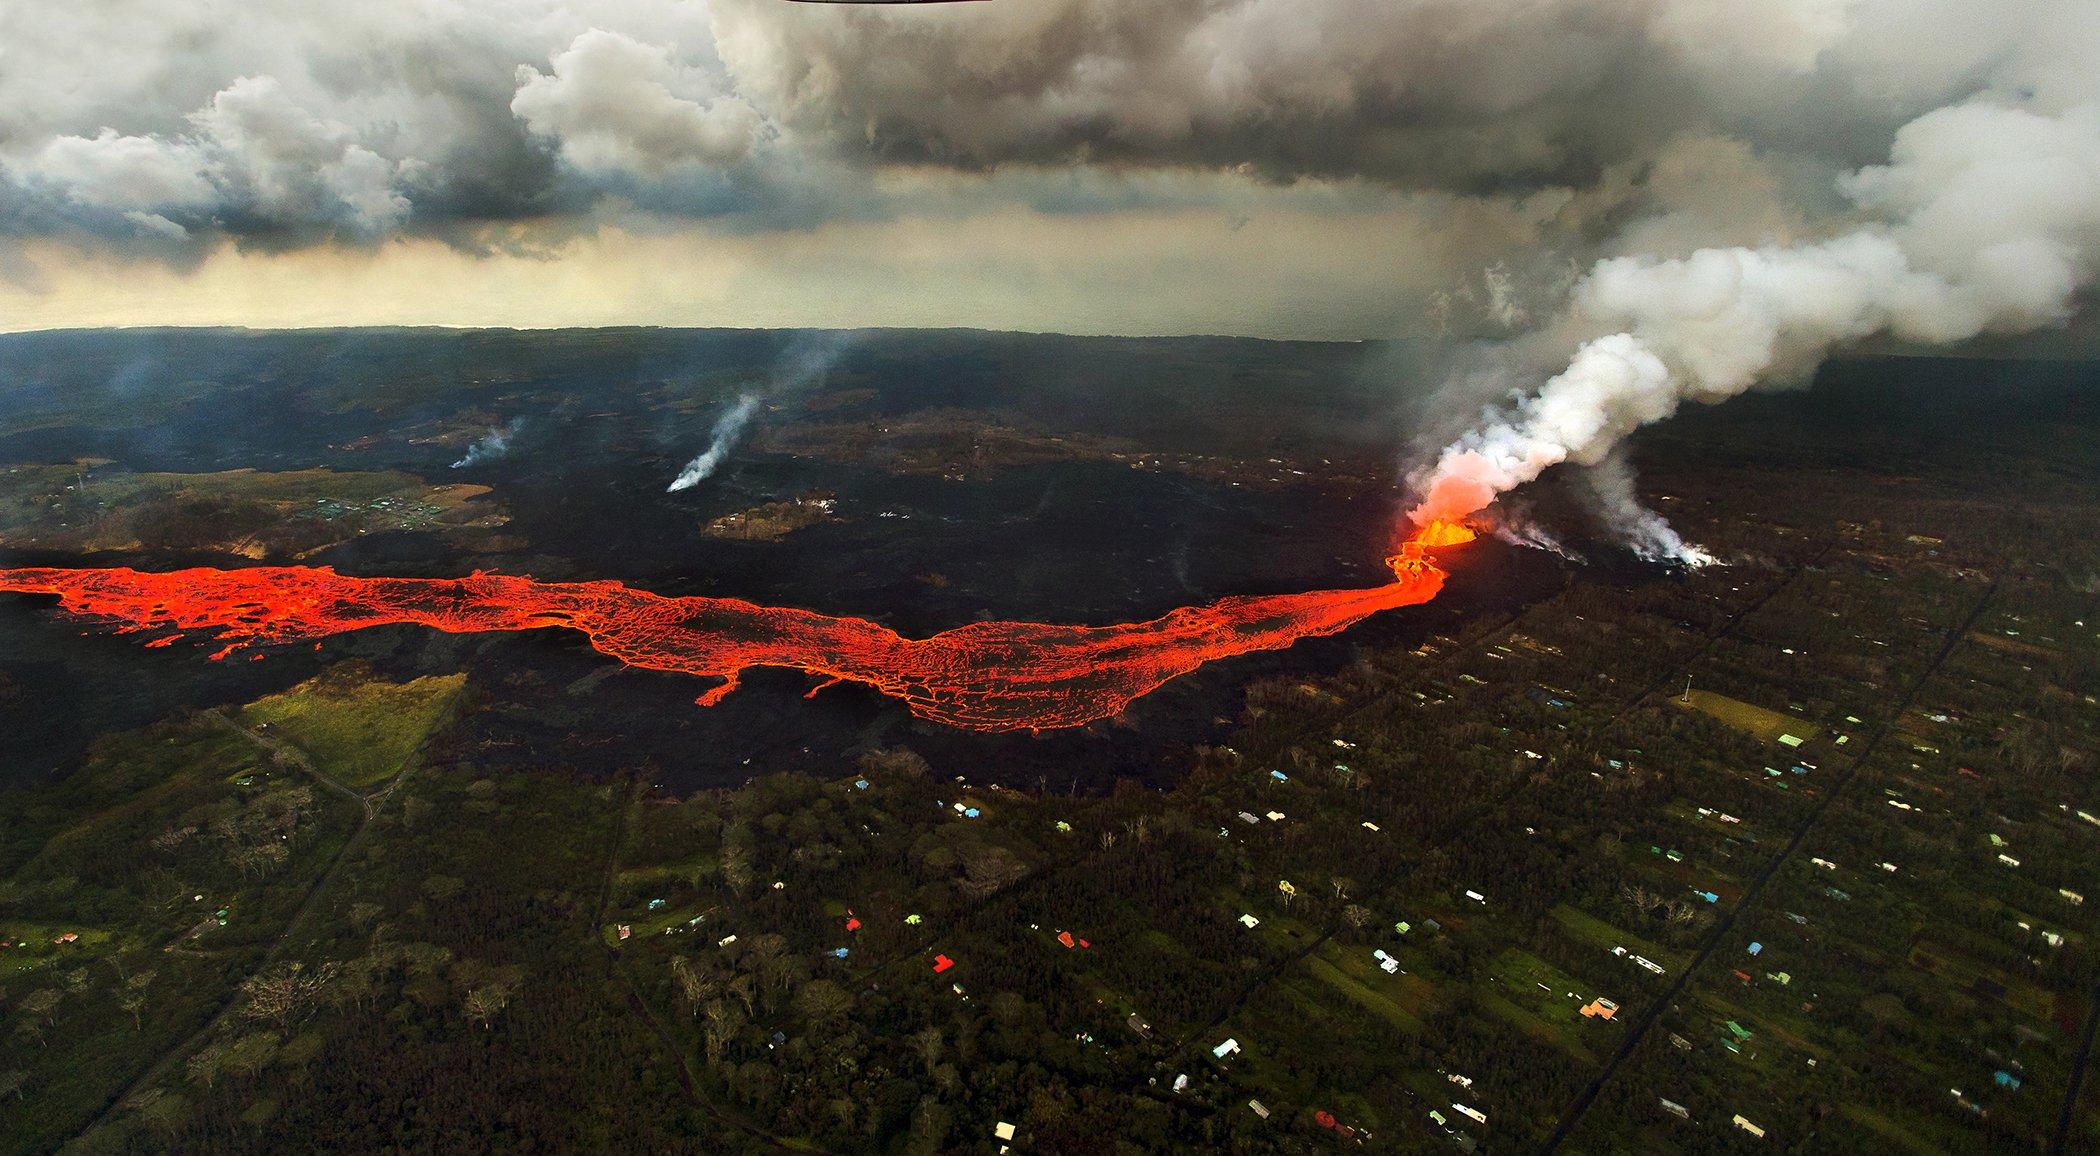 Hawaii-Volcano-Erupt-Lava.jpg